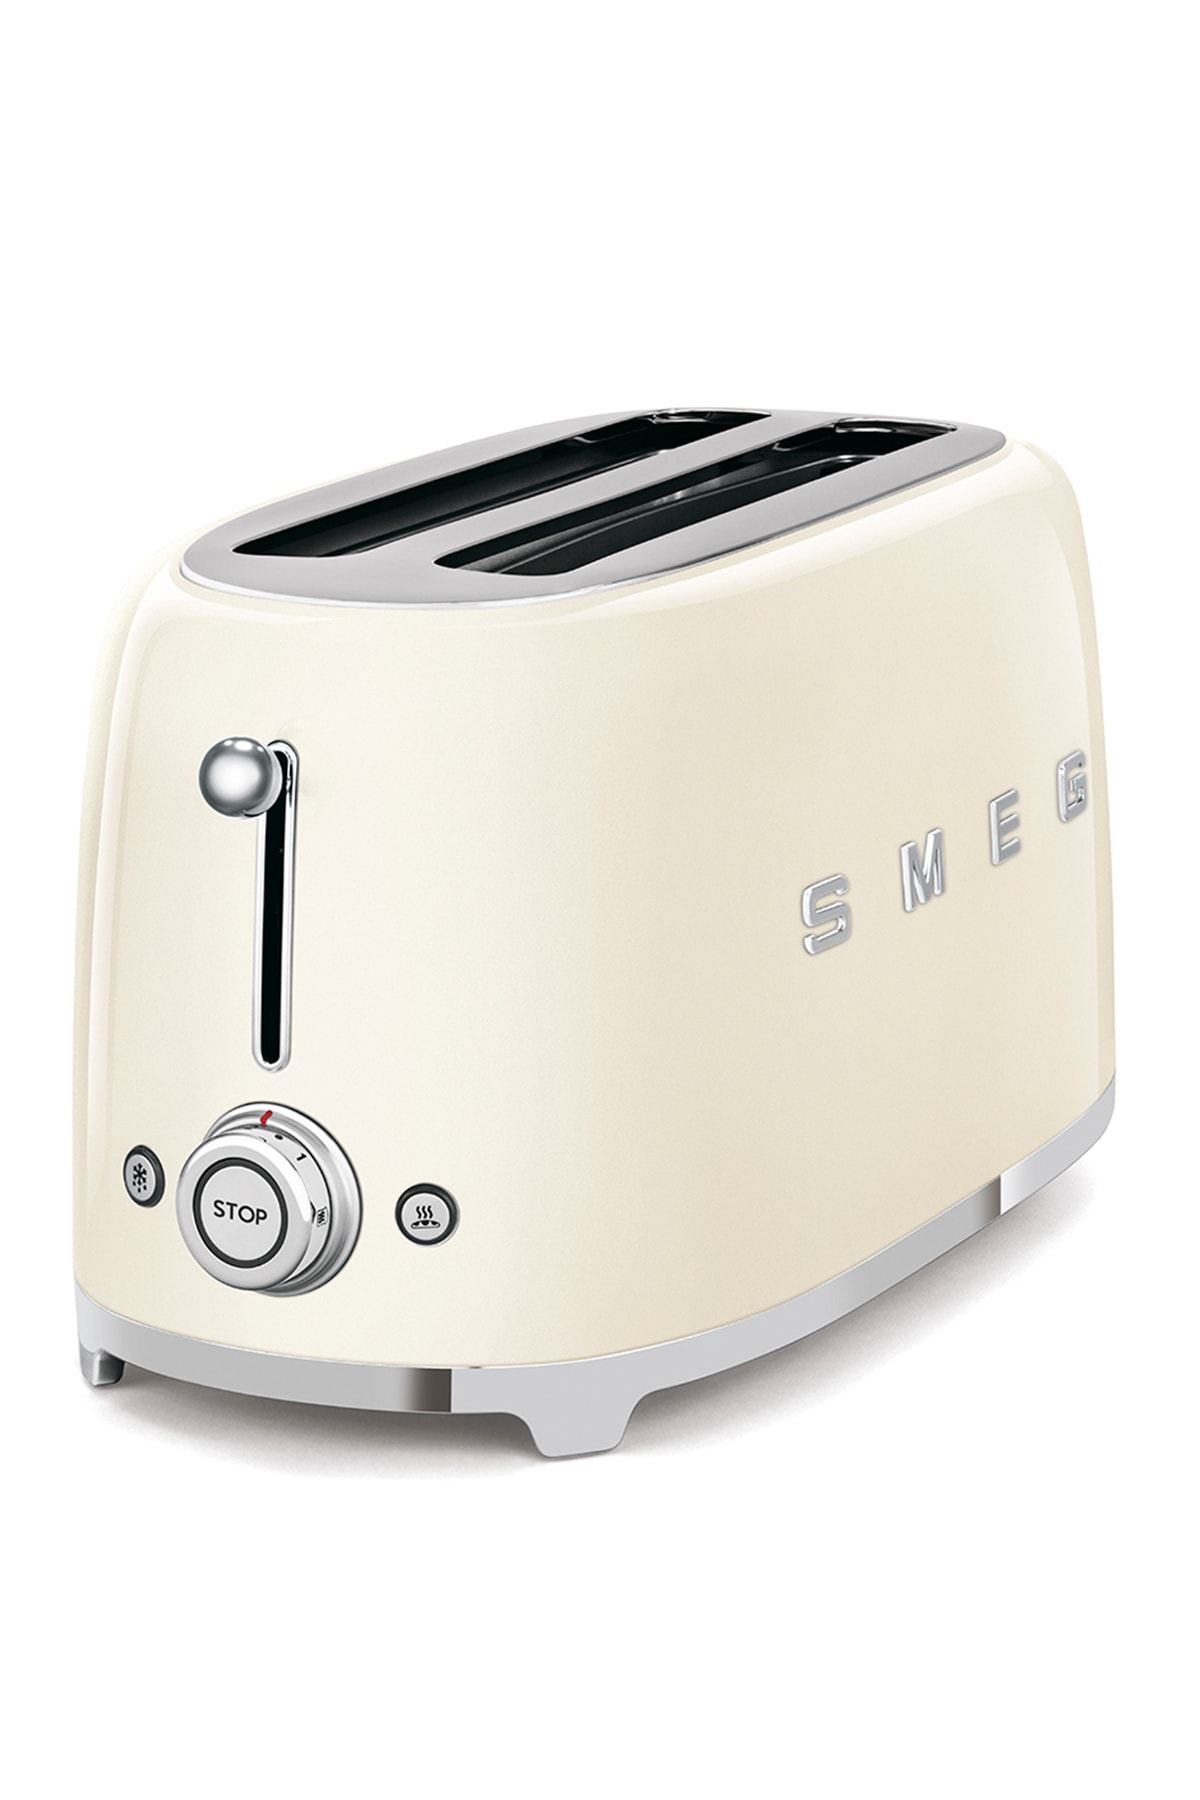 SMEG Krem 4 Dilimli Ekmek Kızartma Makinesi Tsf02creu 2